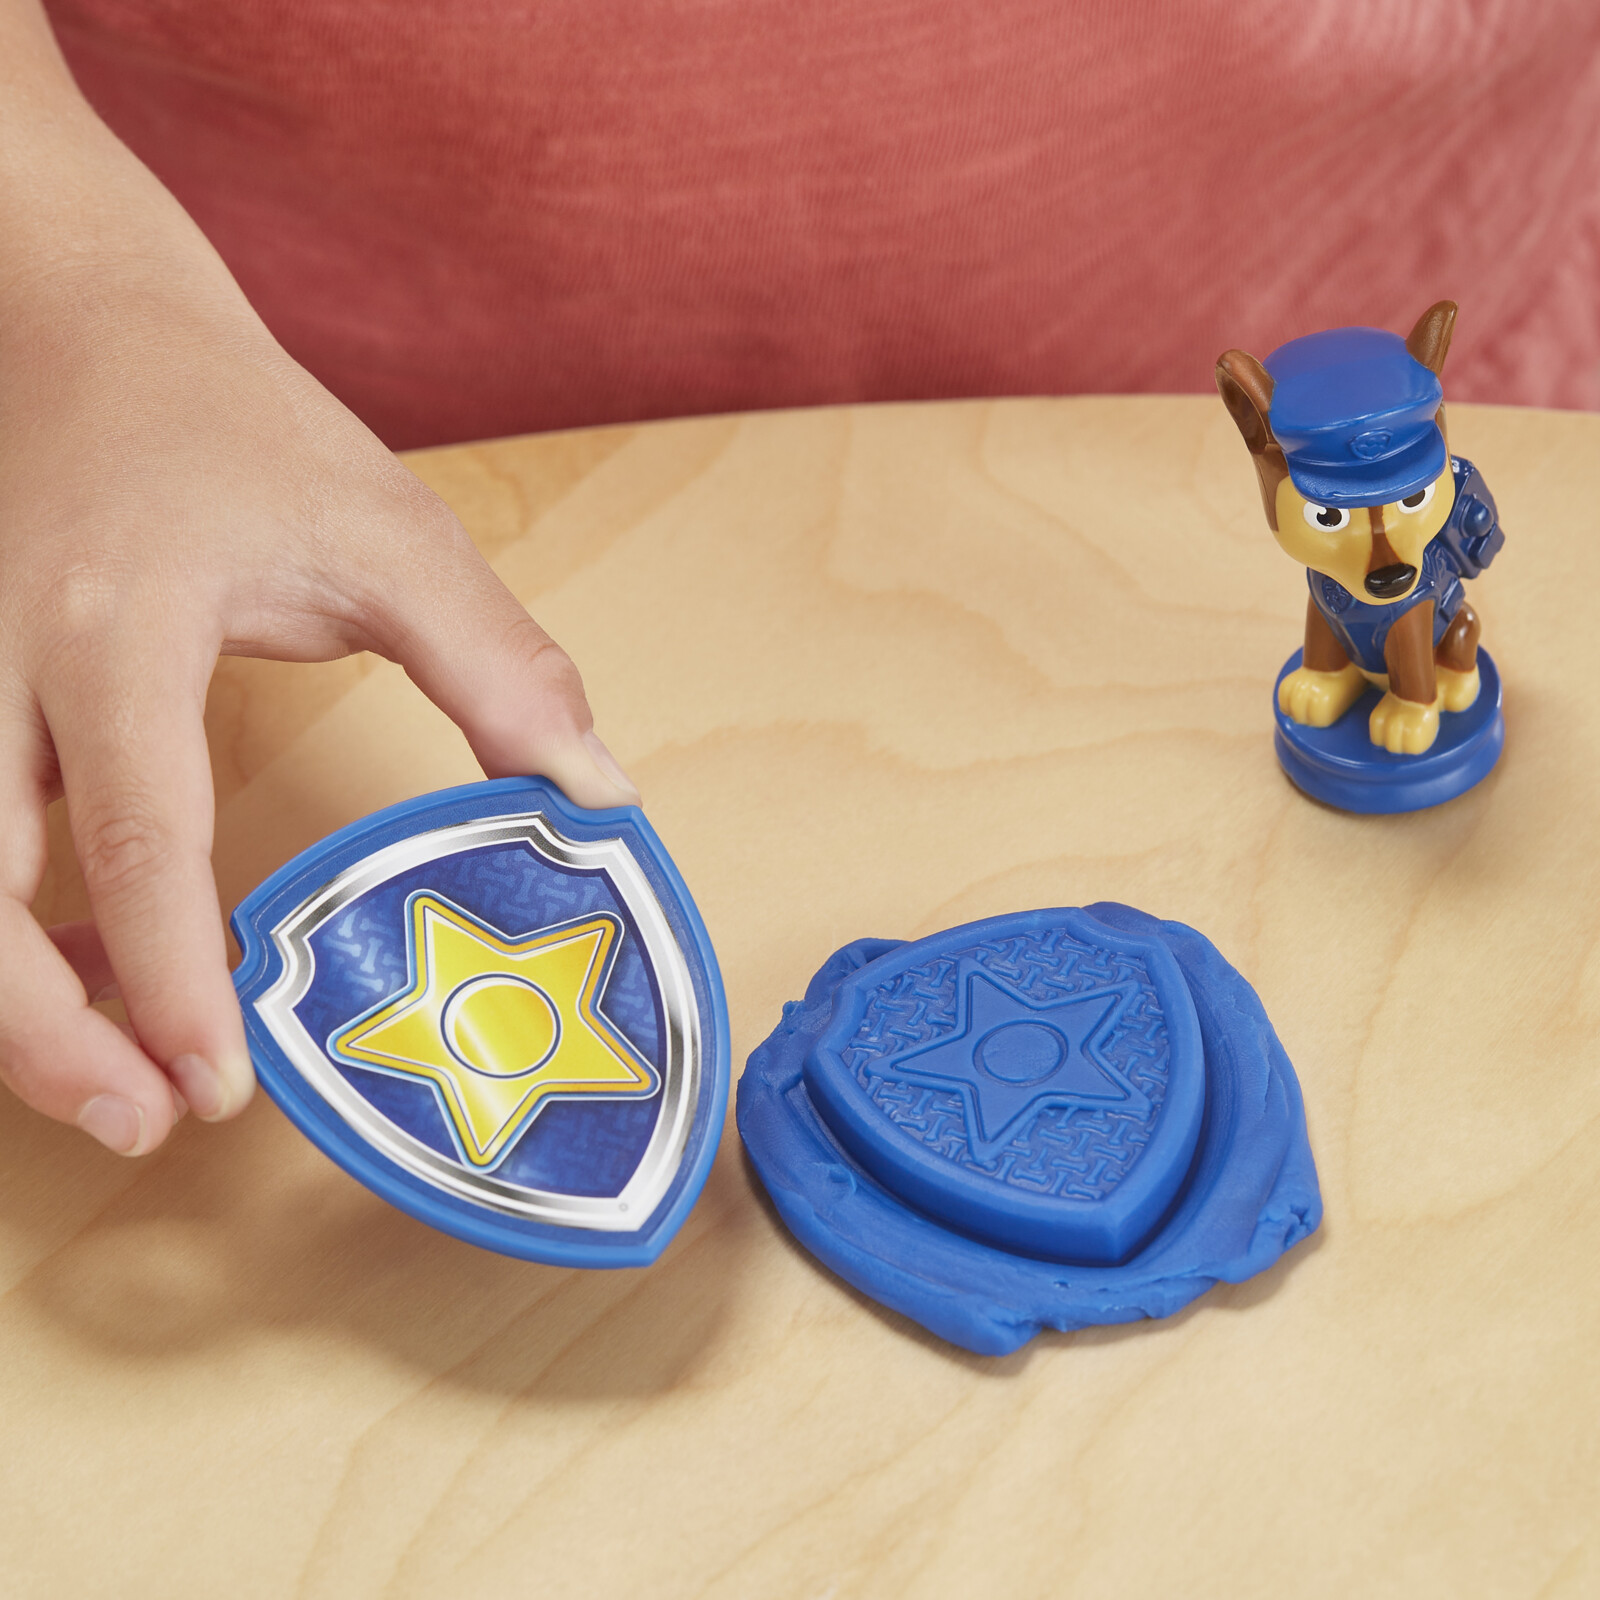 Hasbro Play Doh Paw Patrol Polizeihund Chase, Spielzeug